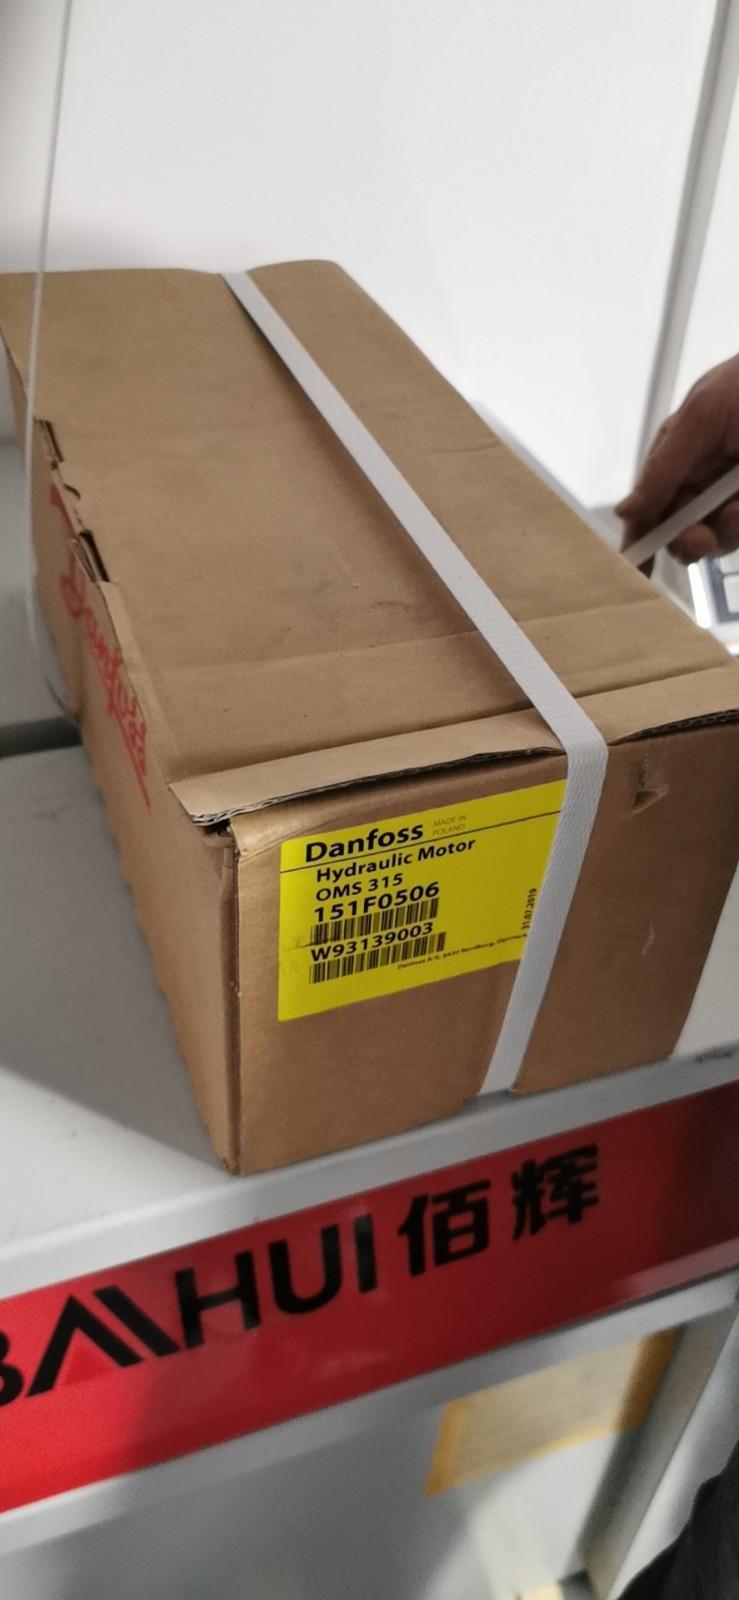 丹佛斯danfossOMV800 EMD-11106135